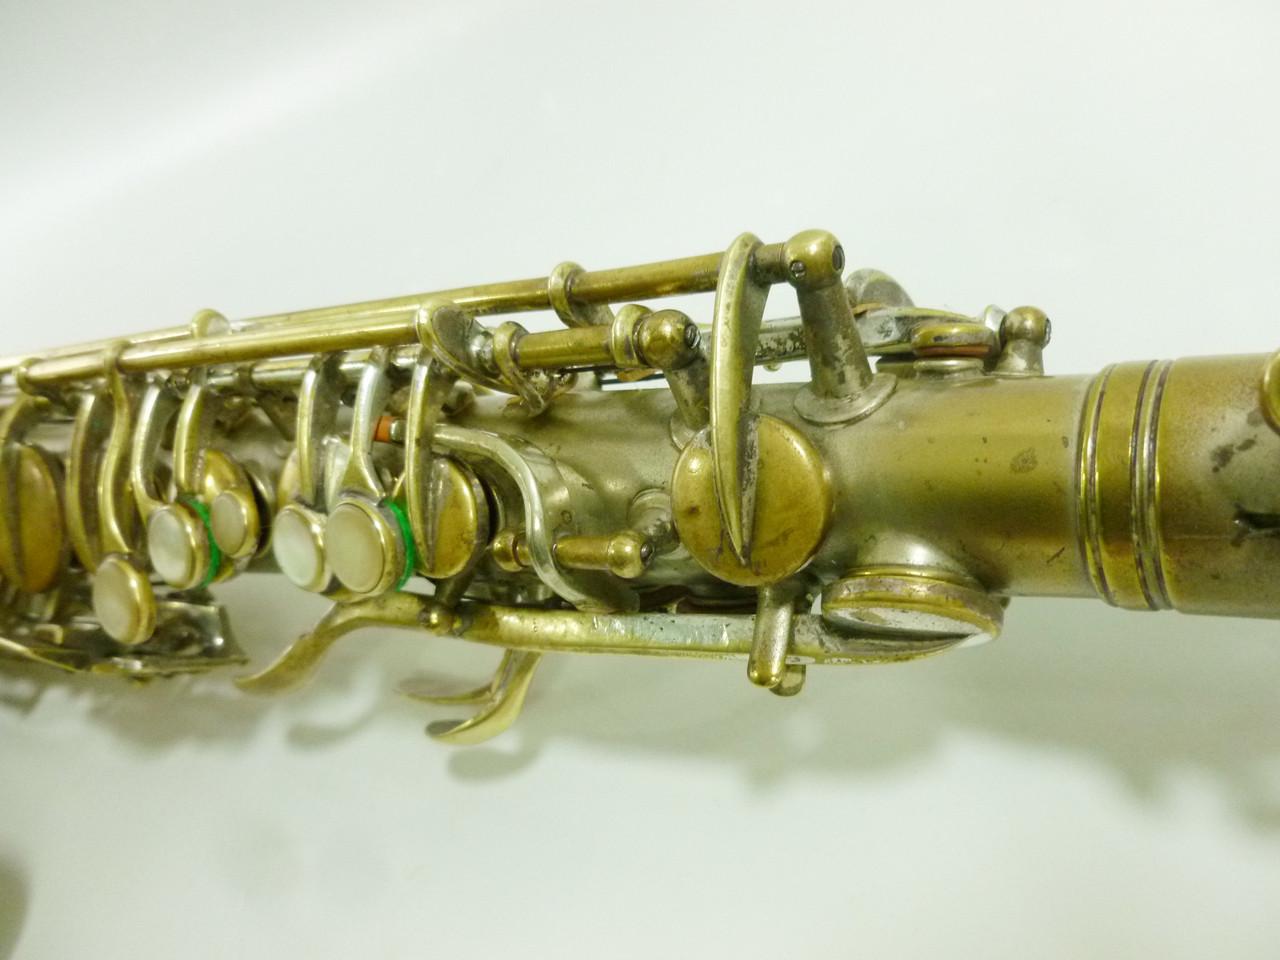 CONN NEW WONDER II (CHU BERRY) C. 1926 ALTO SAX - REFURBISHED 5